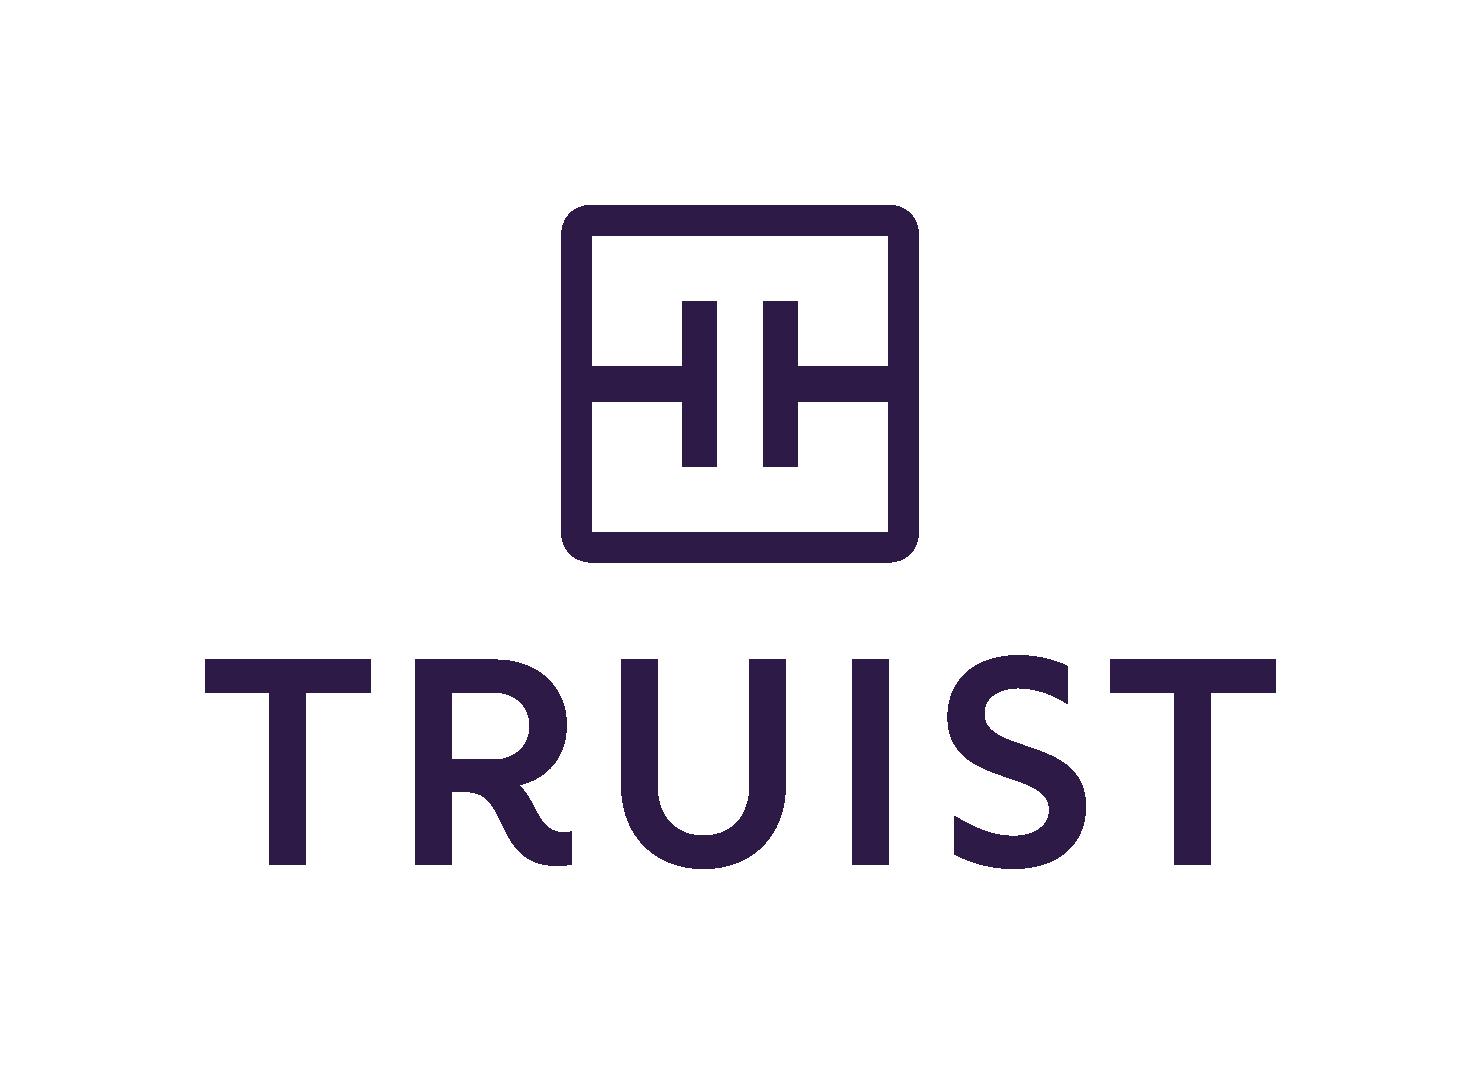 https://www.georgiaaquarium.org/wp-content/uploads/2020/09/2020_Tuist_logo_2.png